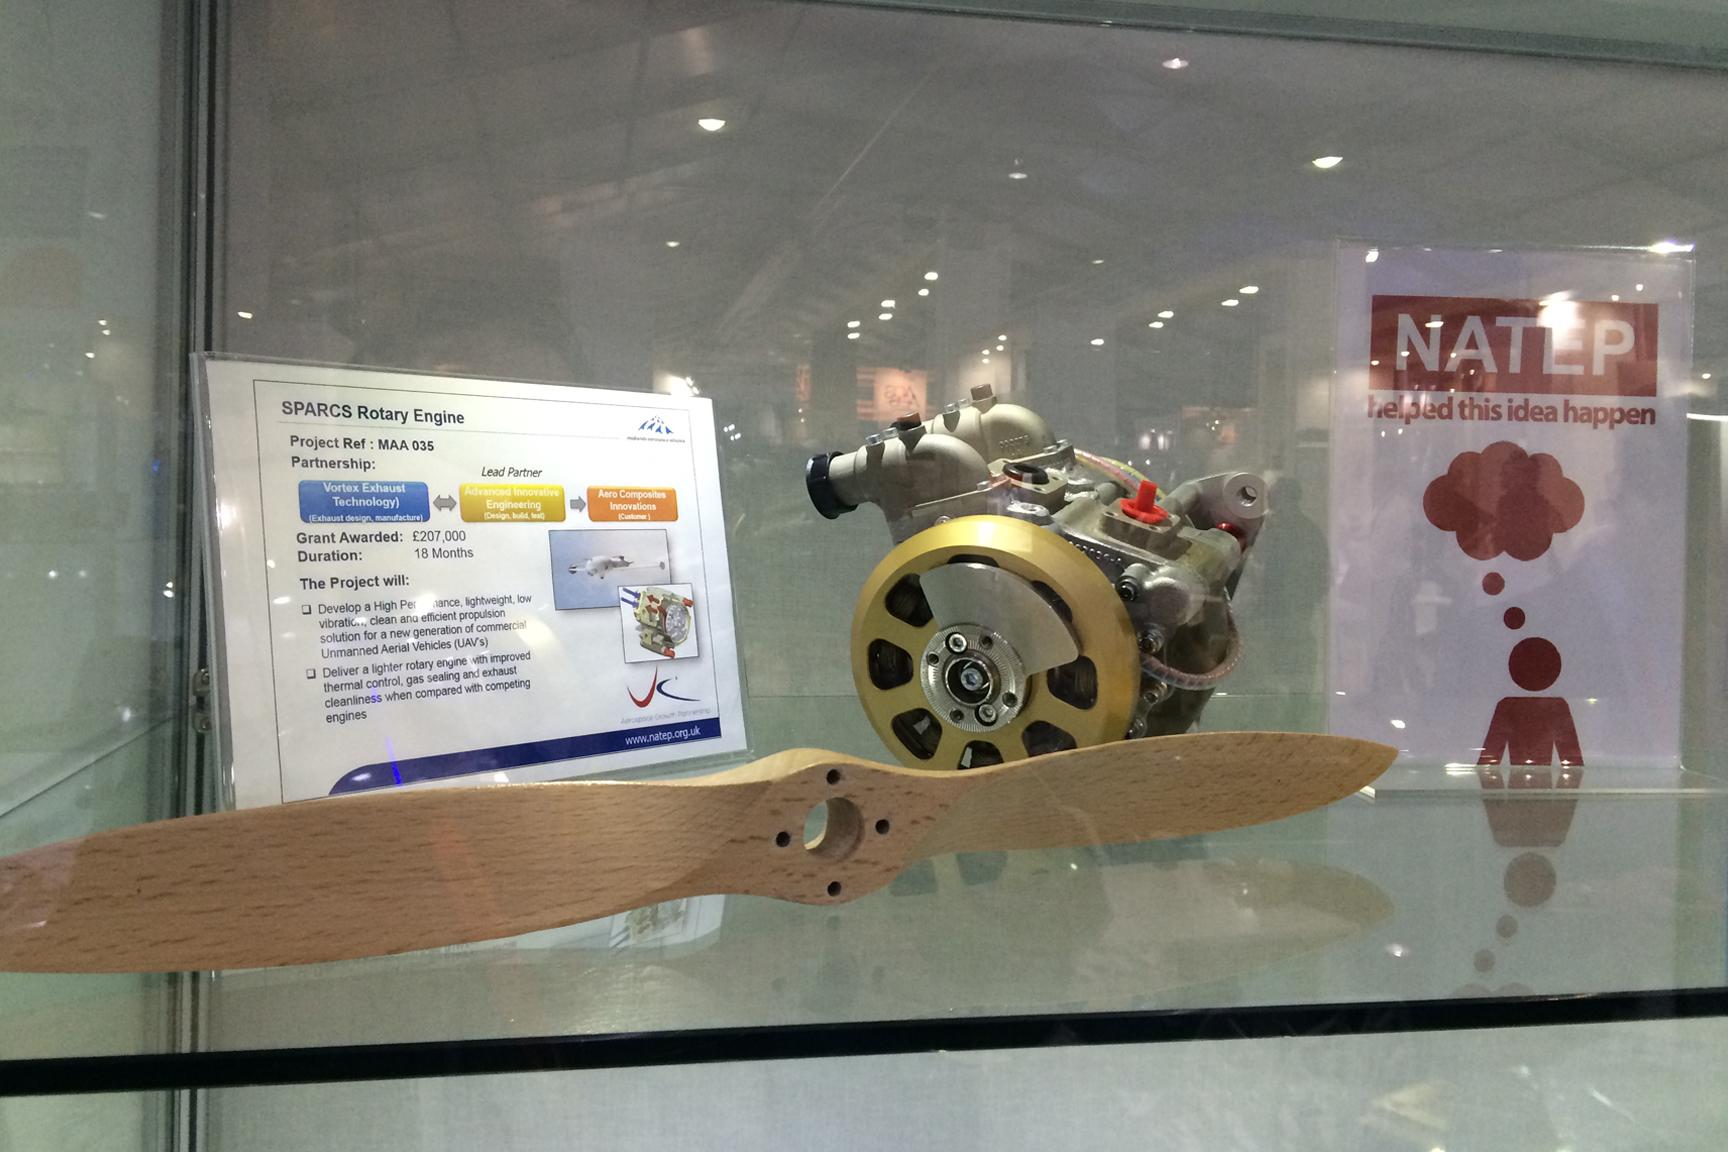 40S UAV Rotary Engine Ready for NATEP Showcase